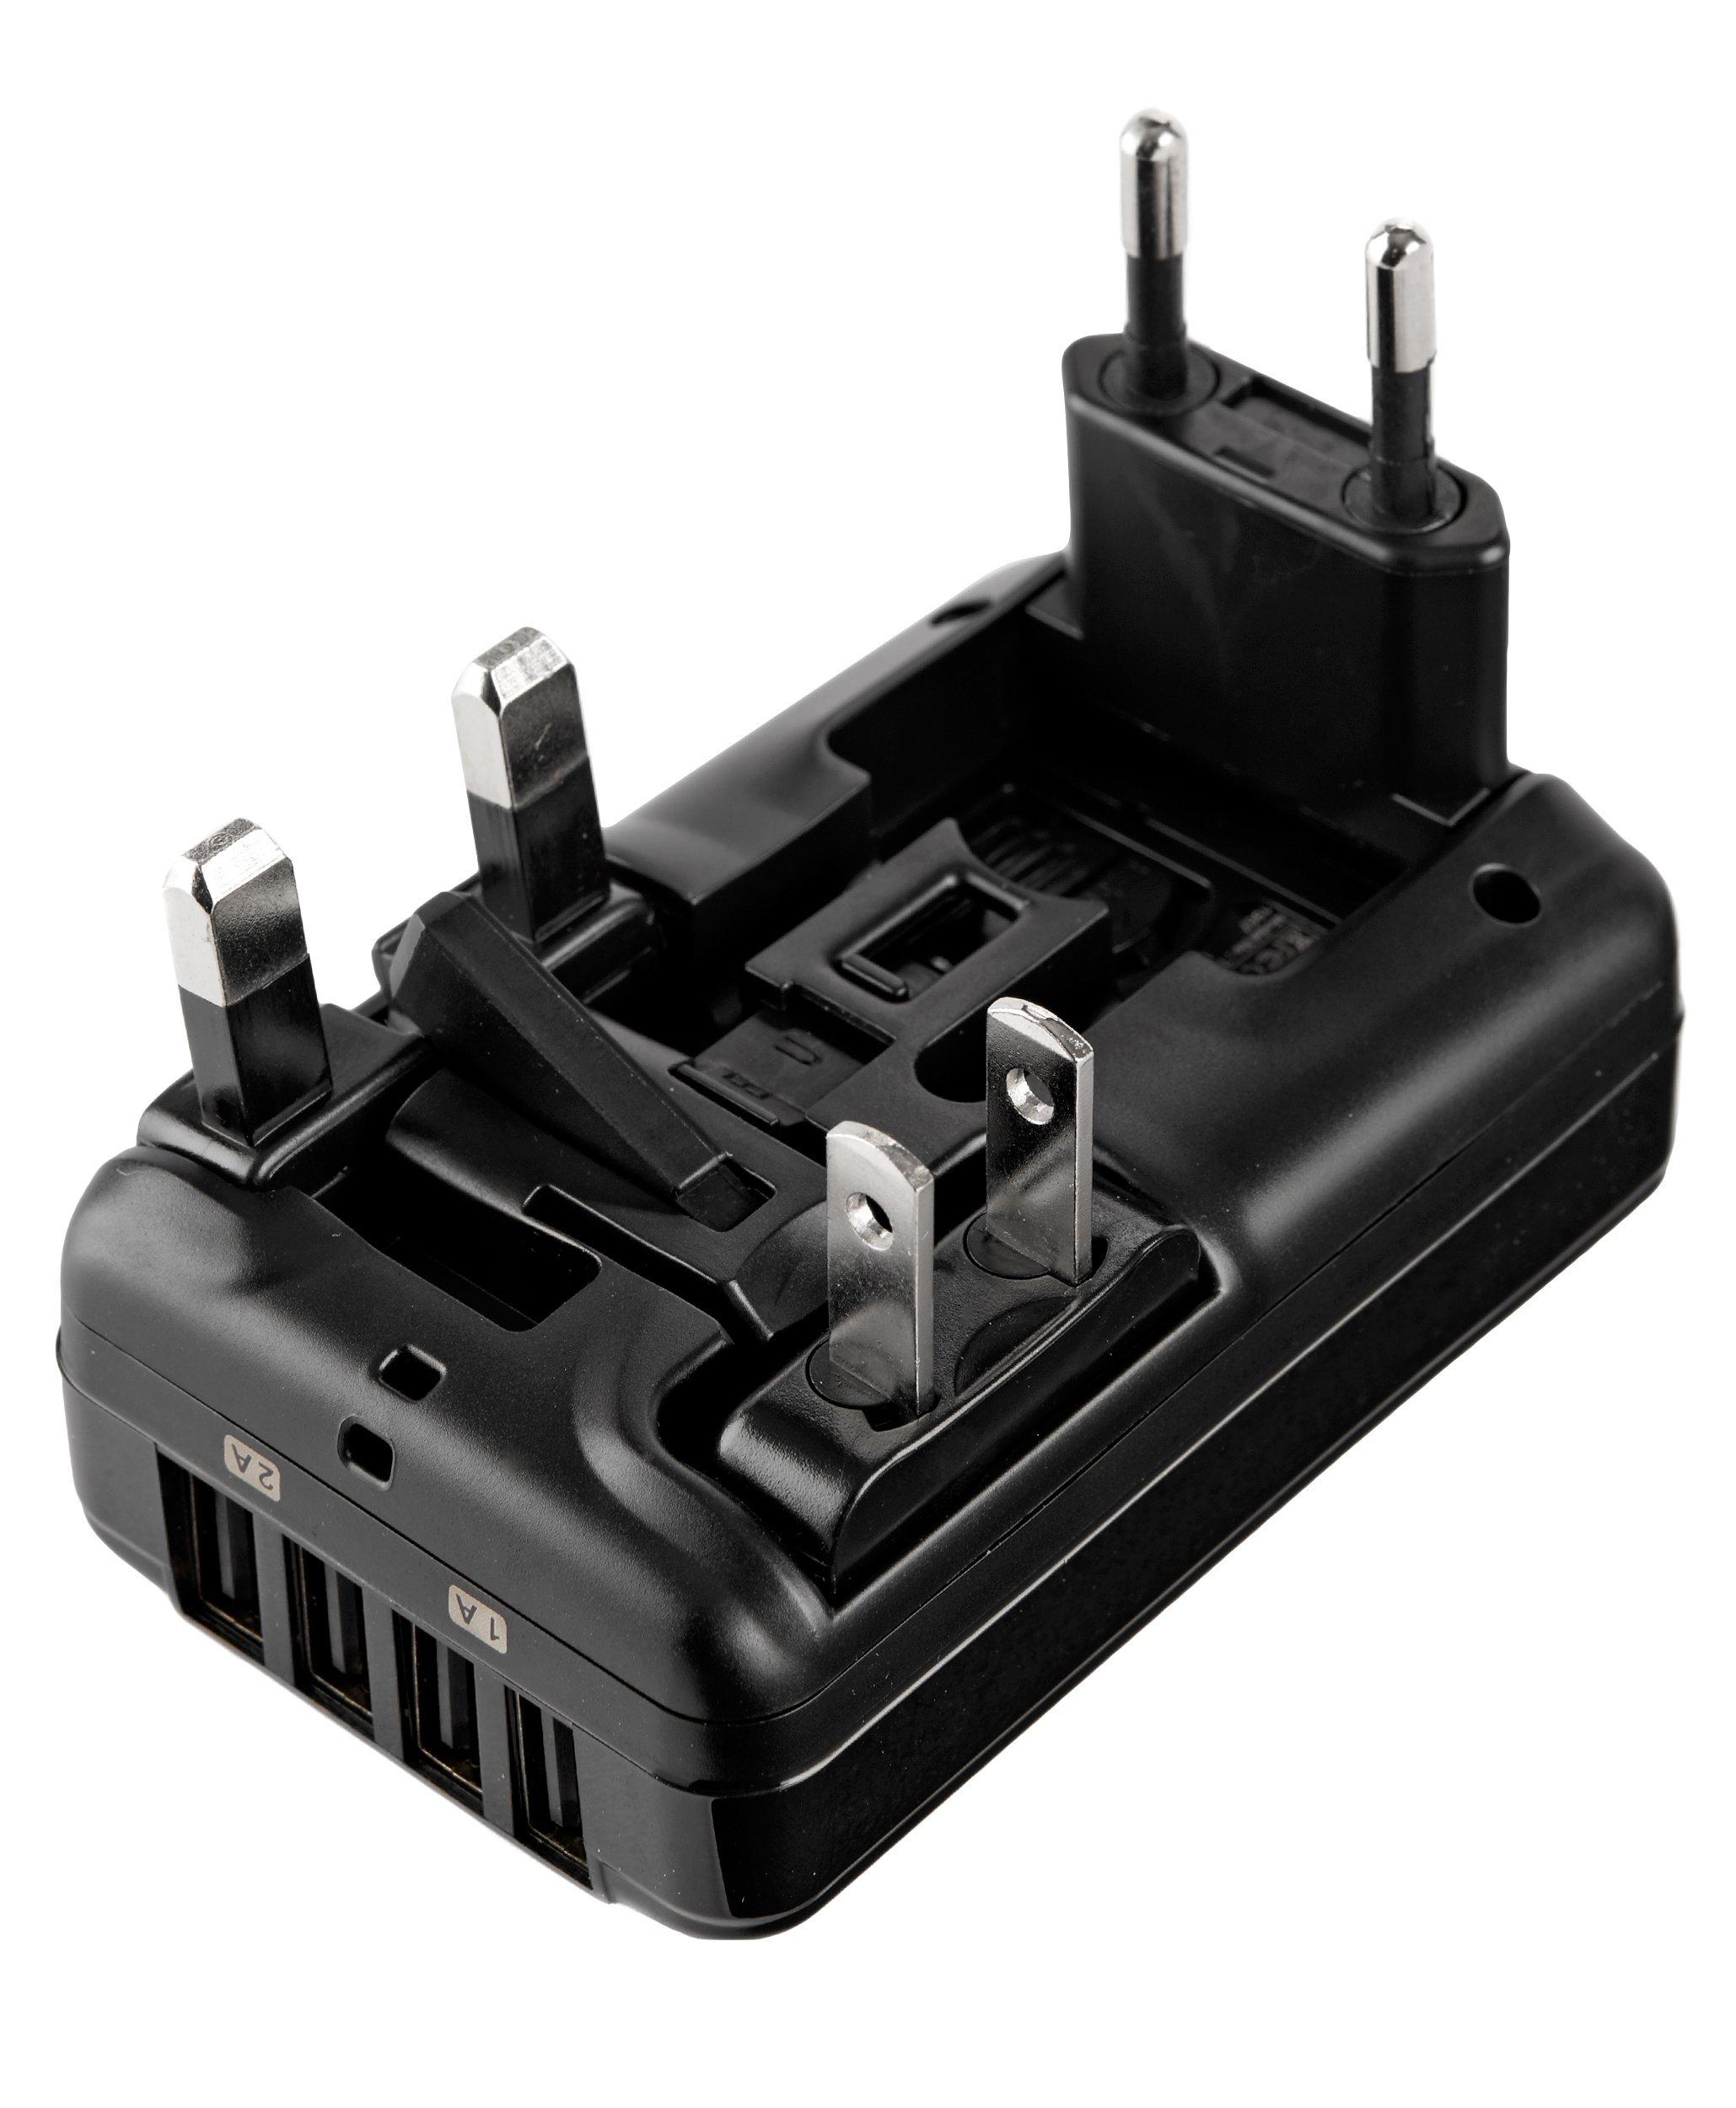 Tumi 4 Port USB Travel Adaptor, Black, One Size by Tumi (Image #3)